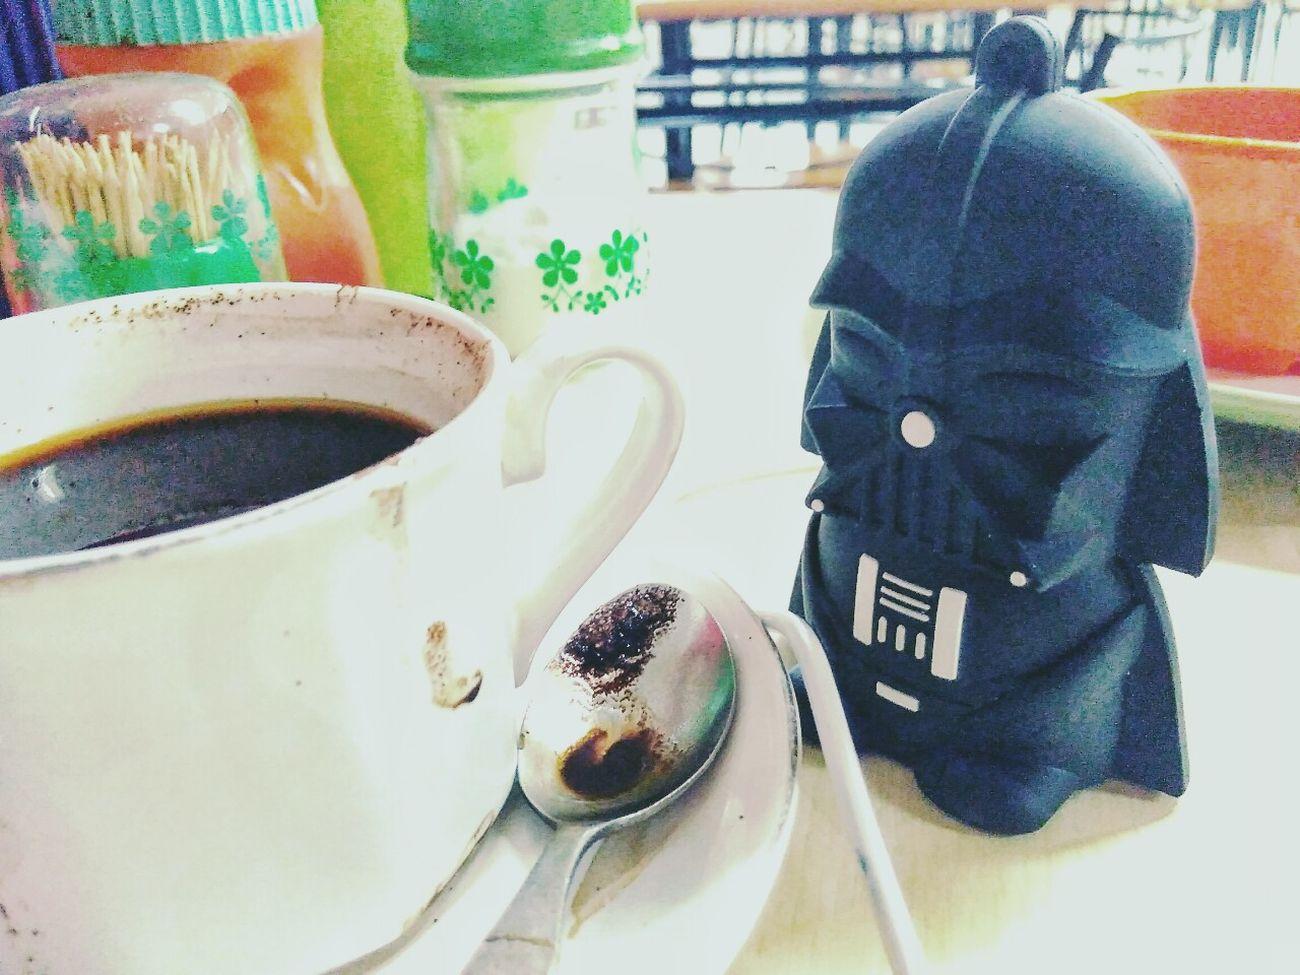 Dark Roast for the Dark Side. Happy Starwars day, MayThe4thBeWithYou - Foodporn Indonesian Coffee Foodtography